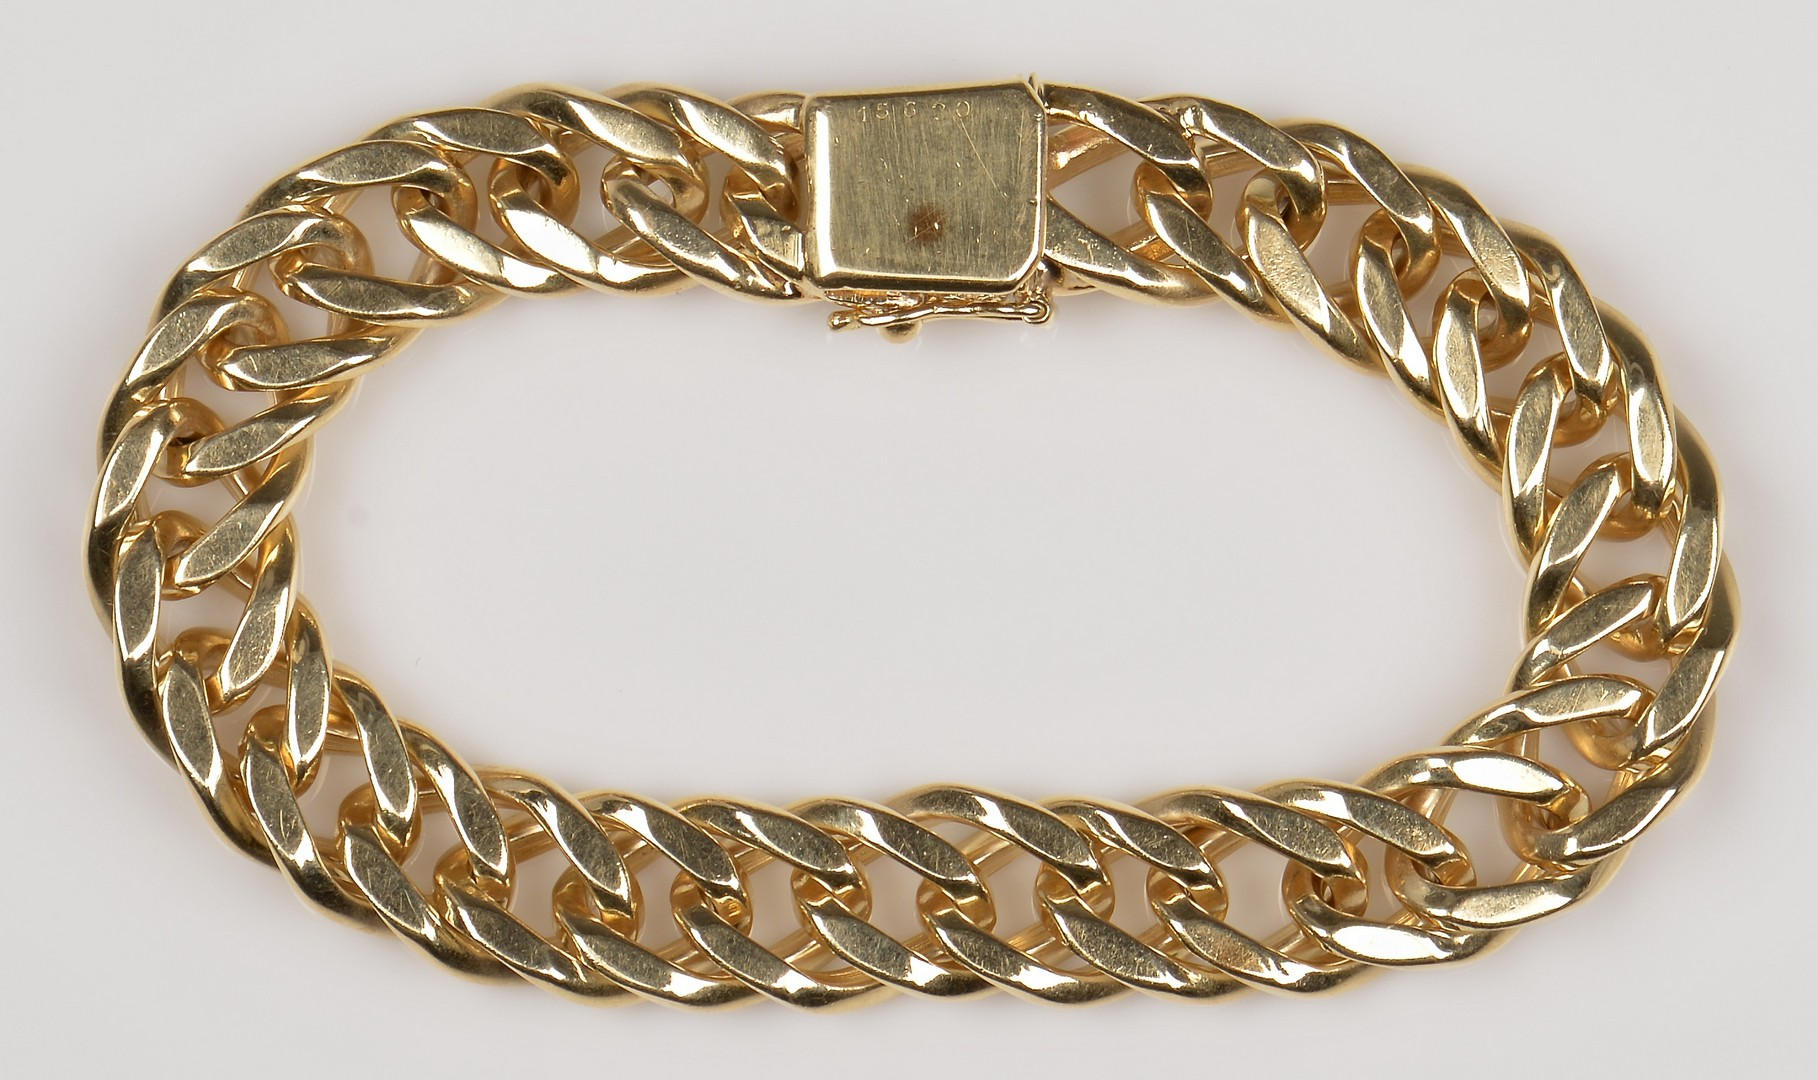 Lot 75: 14k Link Bracelet, 52.6 grams